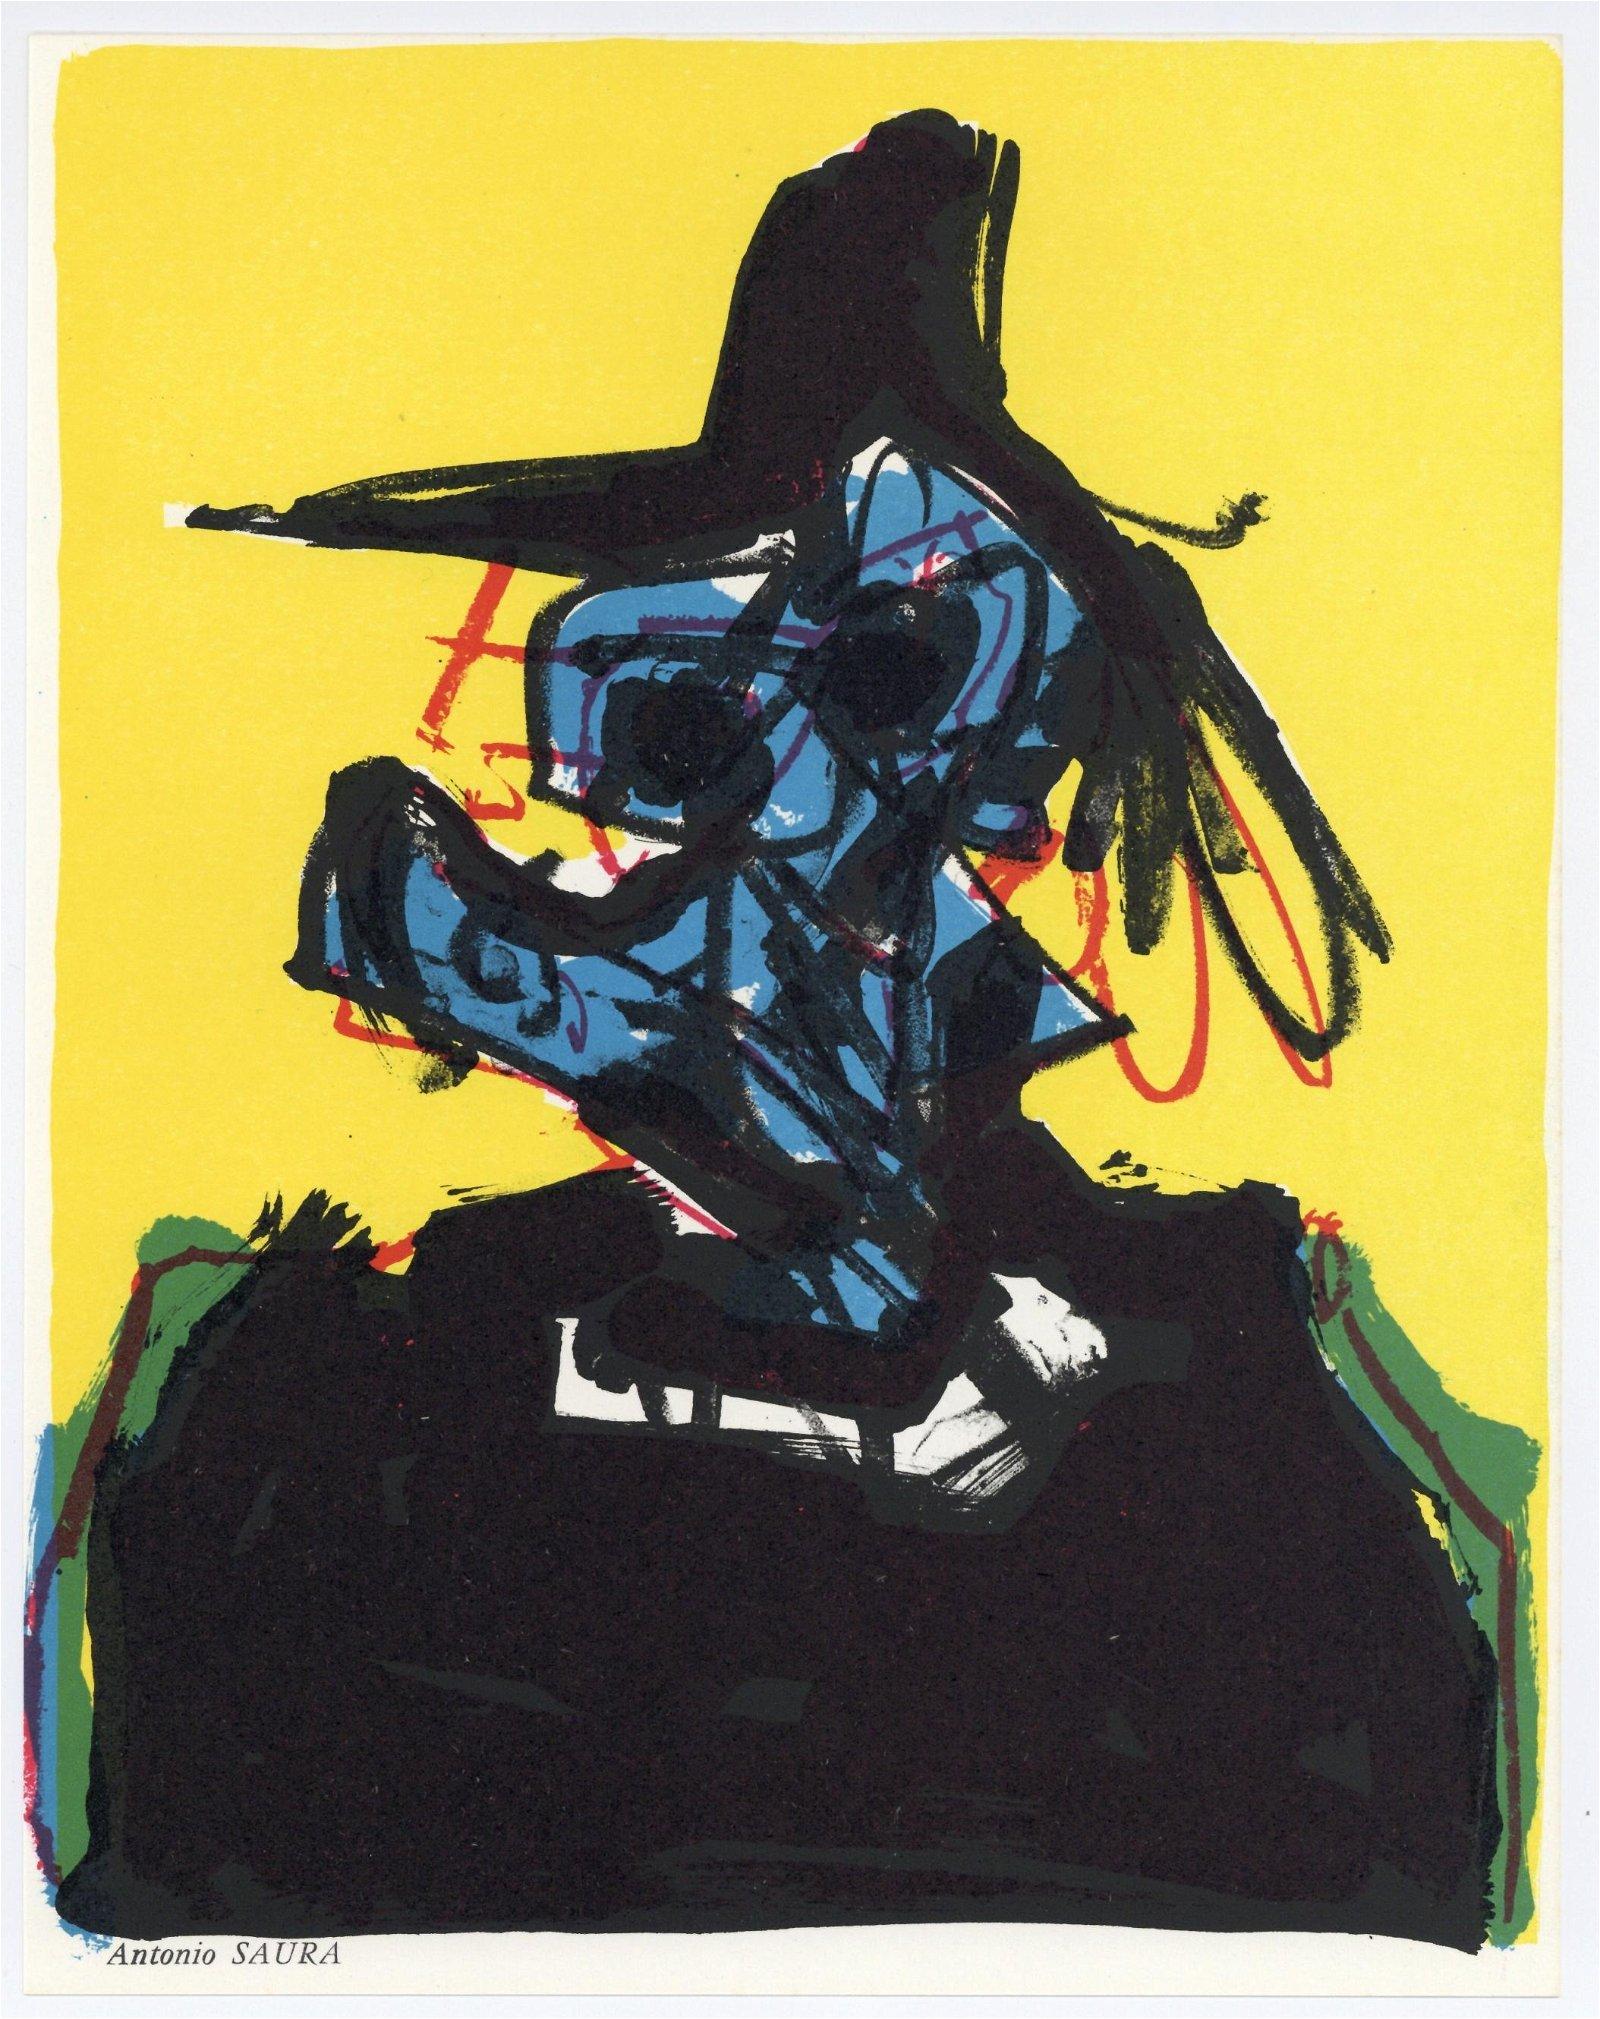 Antonio Saura Atares original lithograph, 1967